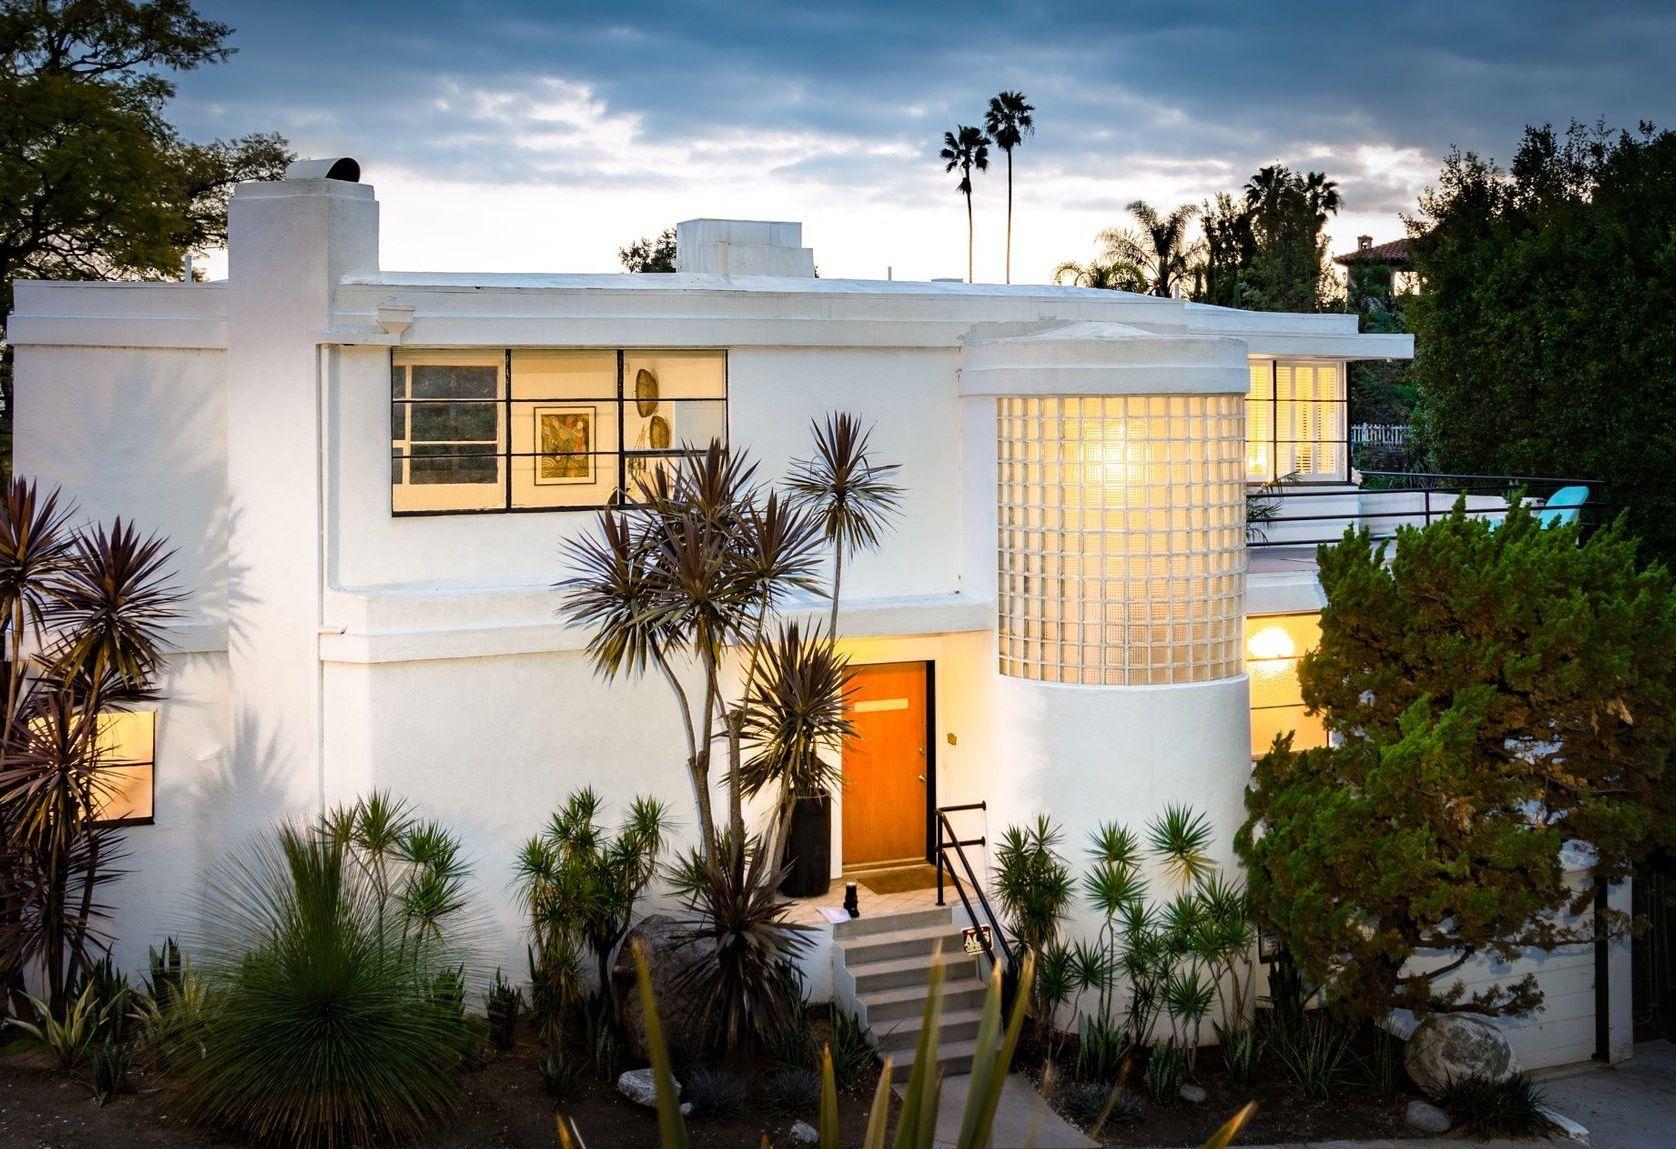 Los Feliz Streamline moderne, Mid century modern house